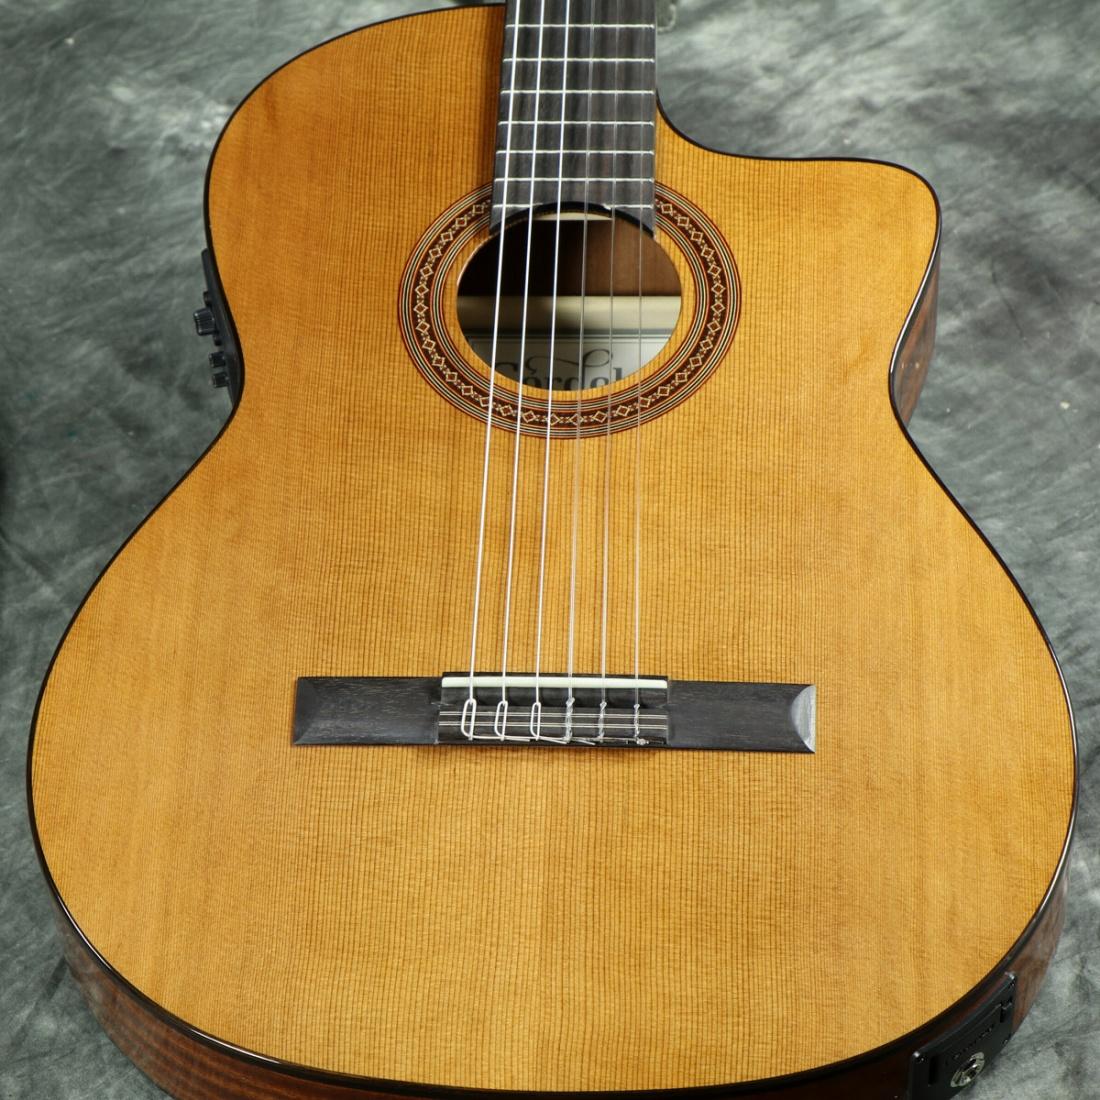 Cordoba / C5-CET 《特典つき!/+80-setcordoba20》【IBERIA Series】 コルドバ エレガット クラシックギター ガットギター